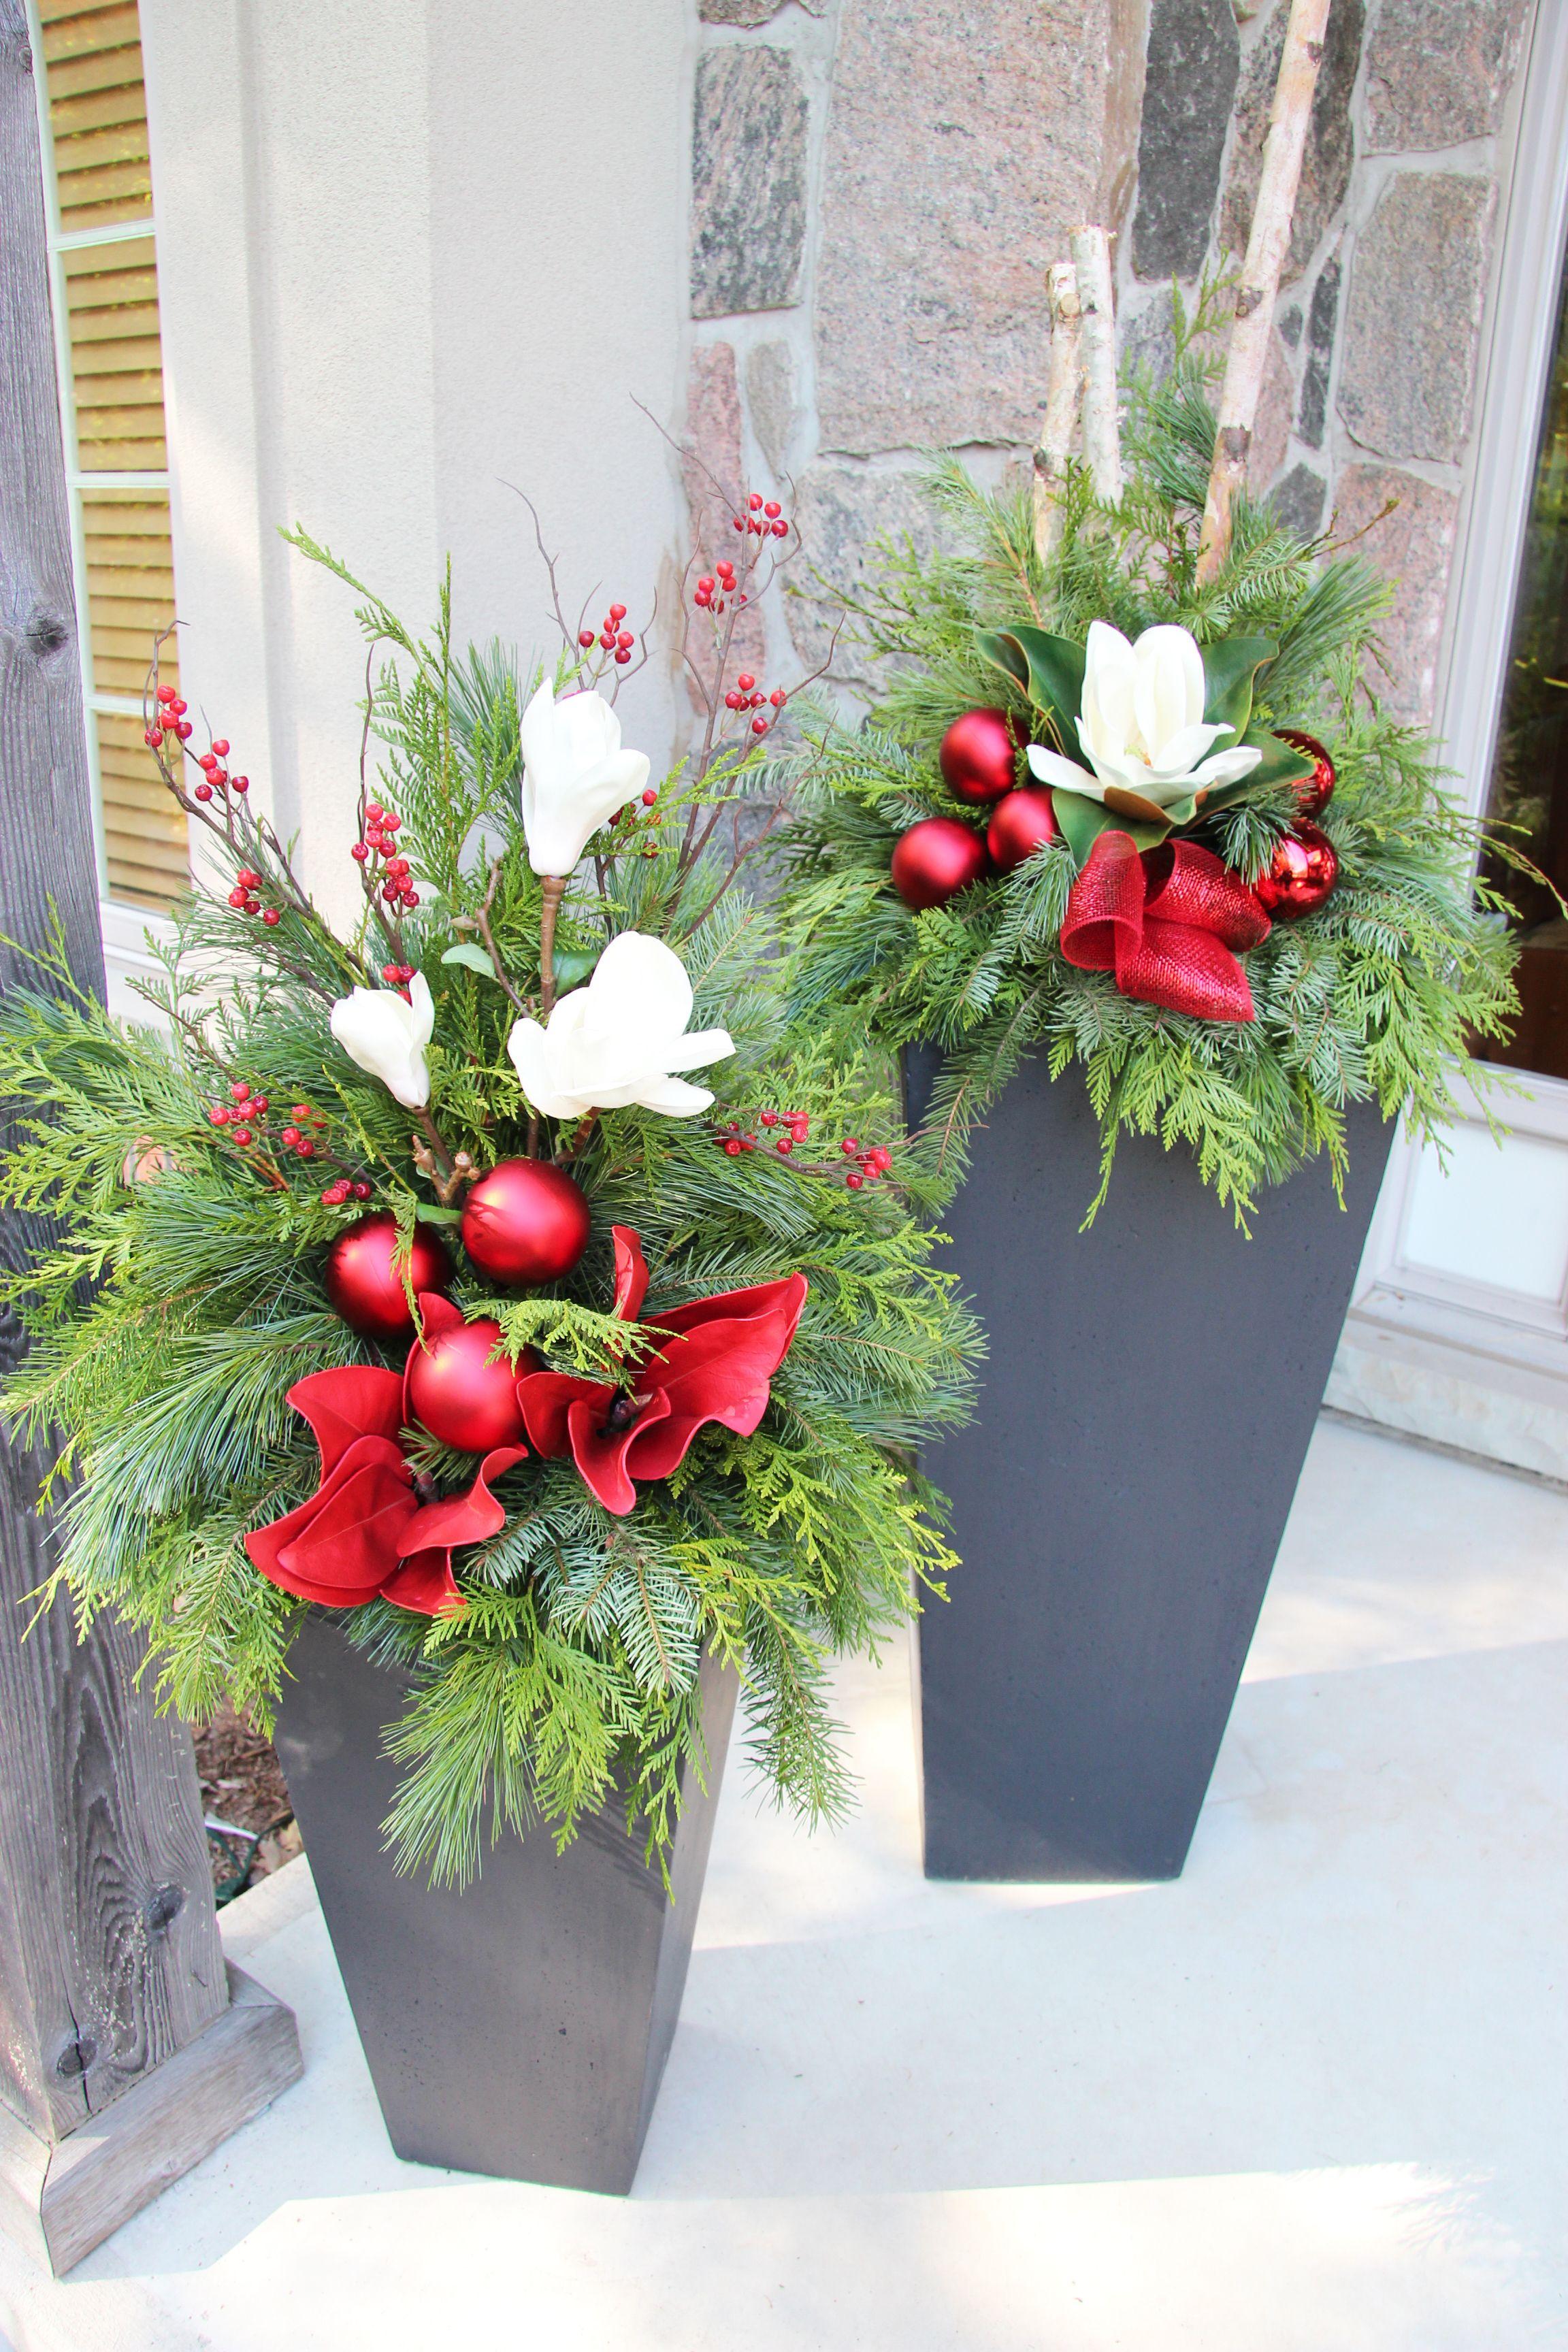 Outdoor Christmas Planter Christmas arrangements